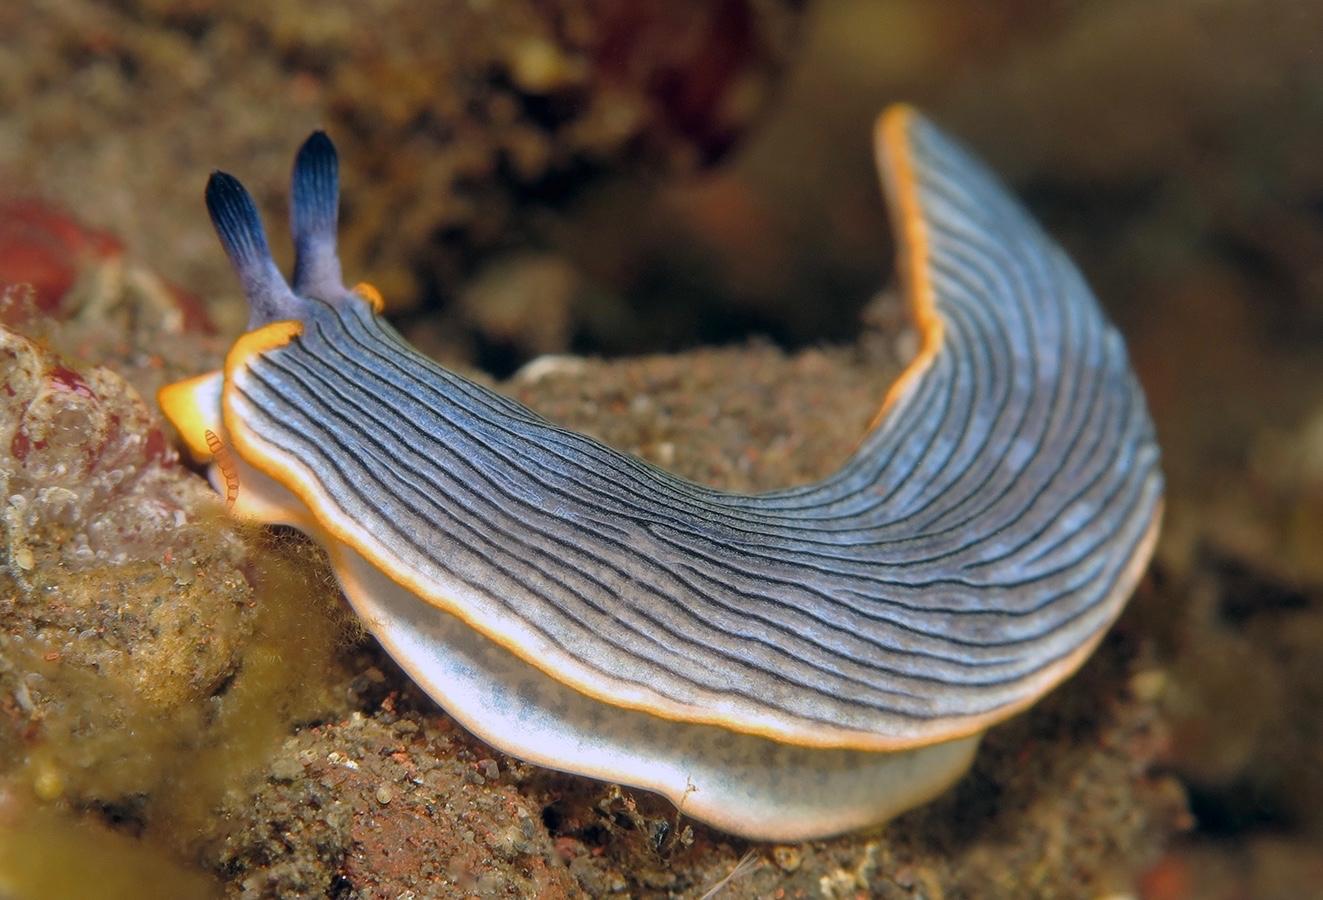 Dermatobranchus sp   未被描述的片鳃海蛞蝓  巴厘岛图蓝本 Tulamben 印度尼西亚 Indonesia @lazydiving.com 潜水时光